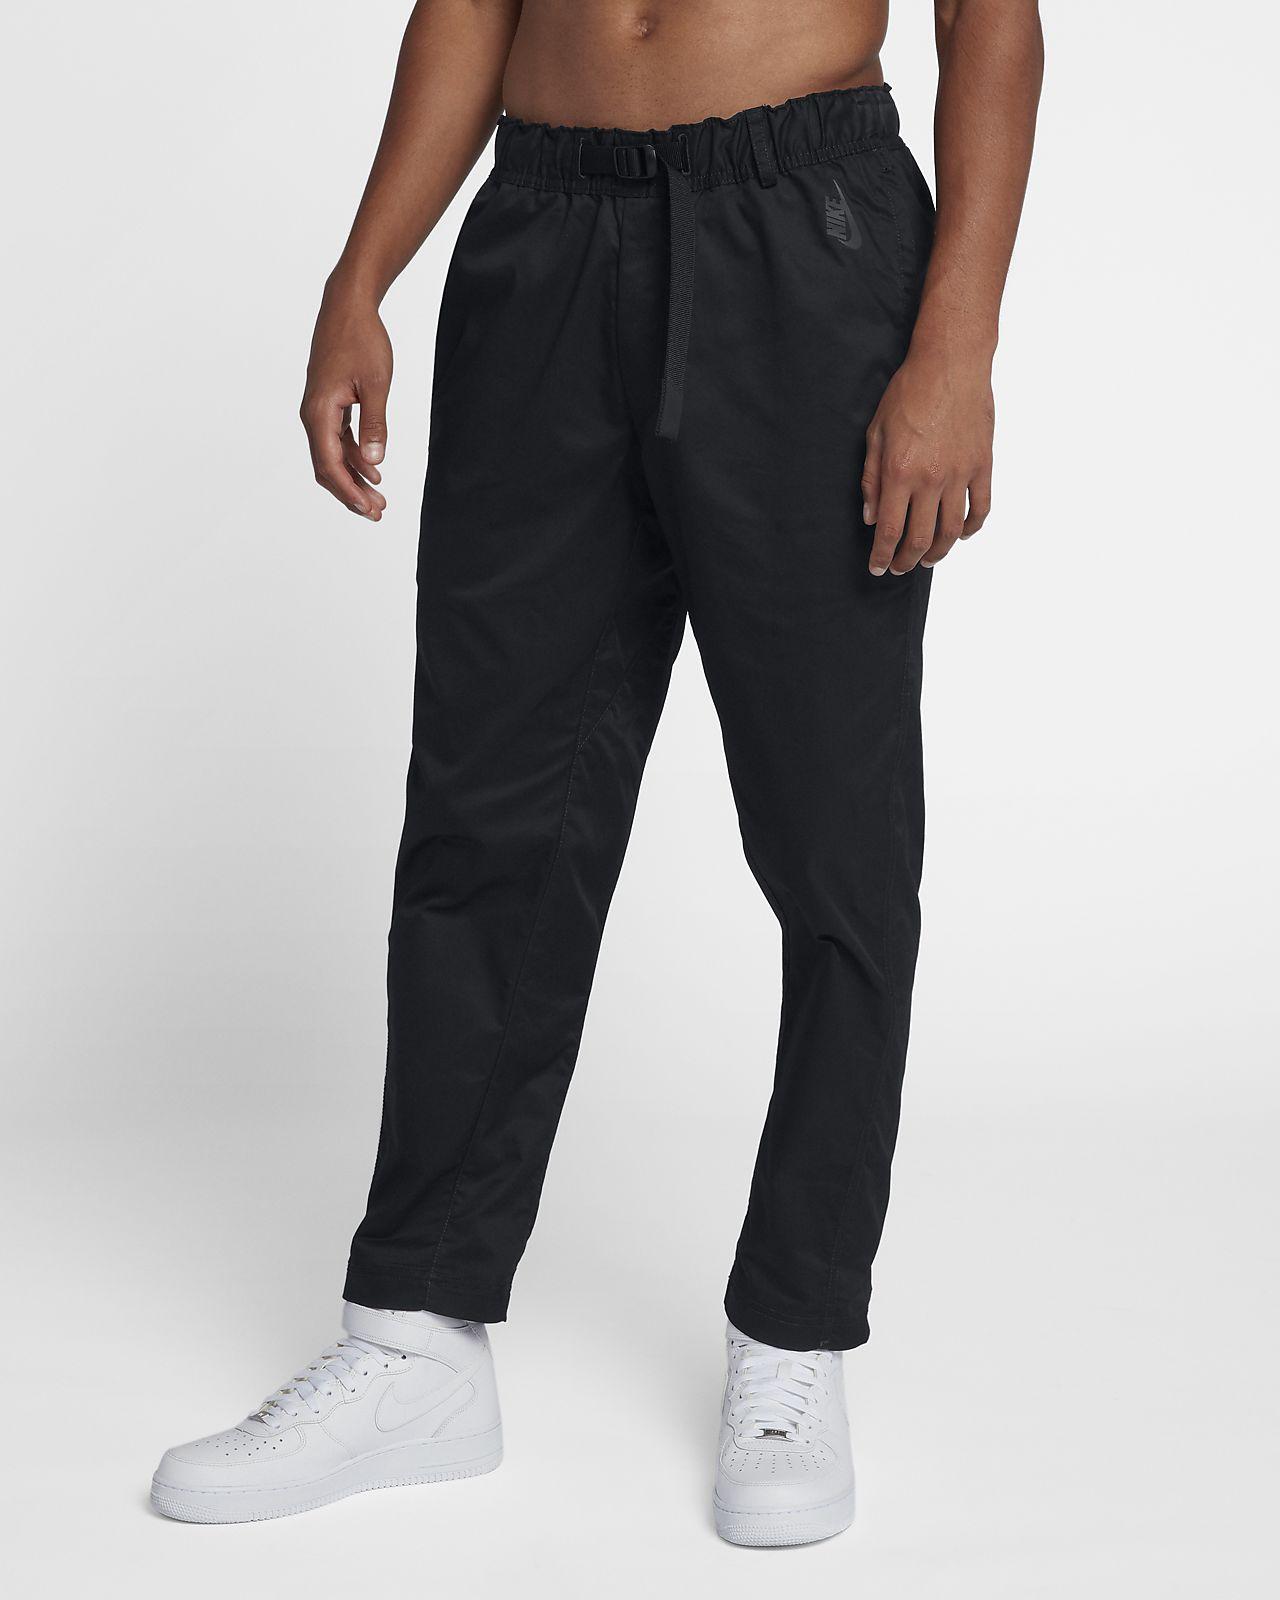 NikeLab Collection 男子梭织长裤